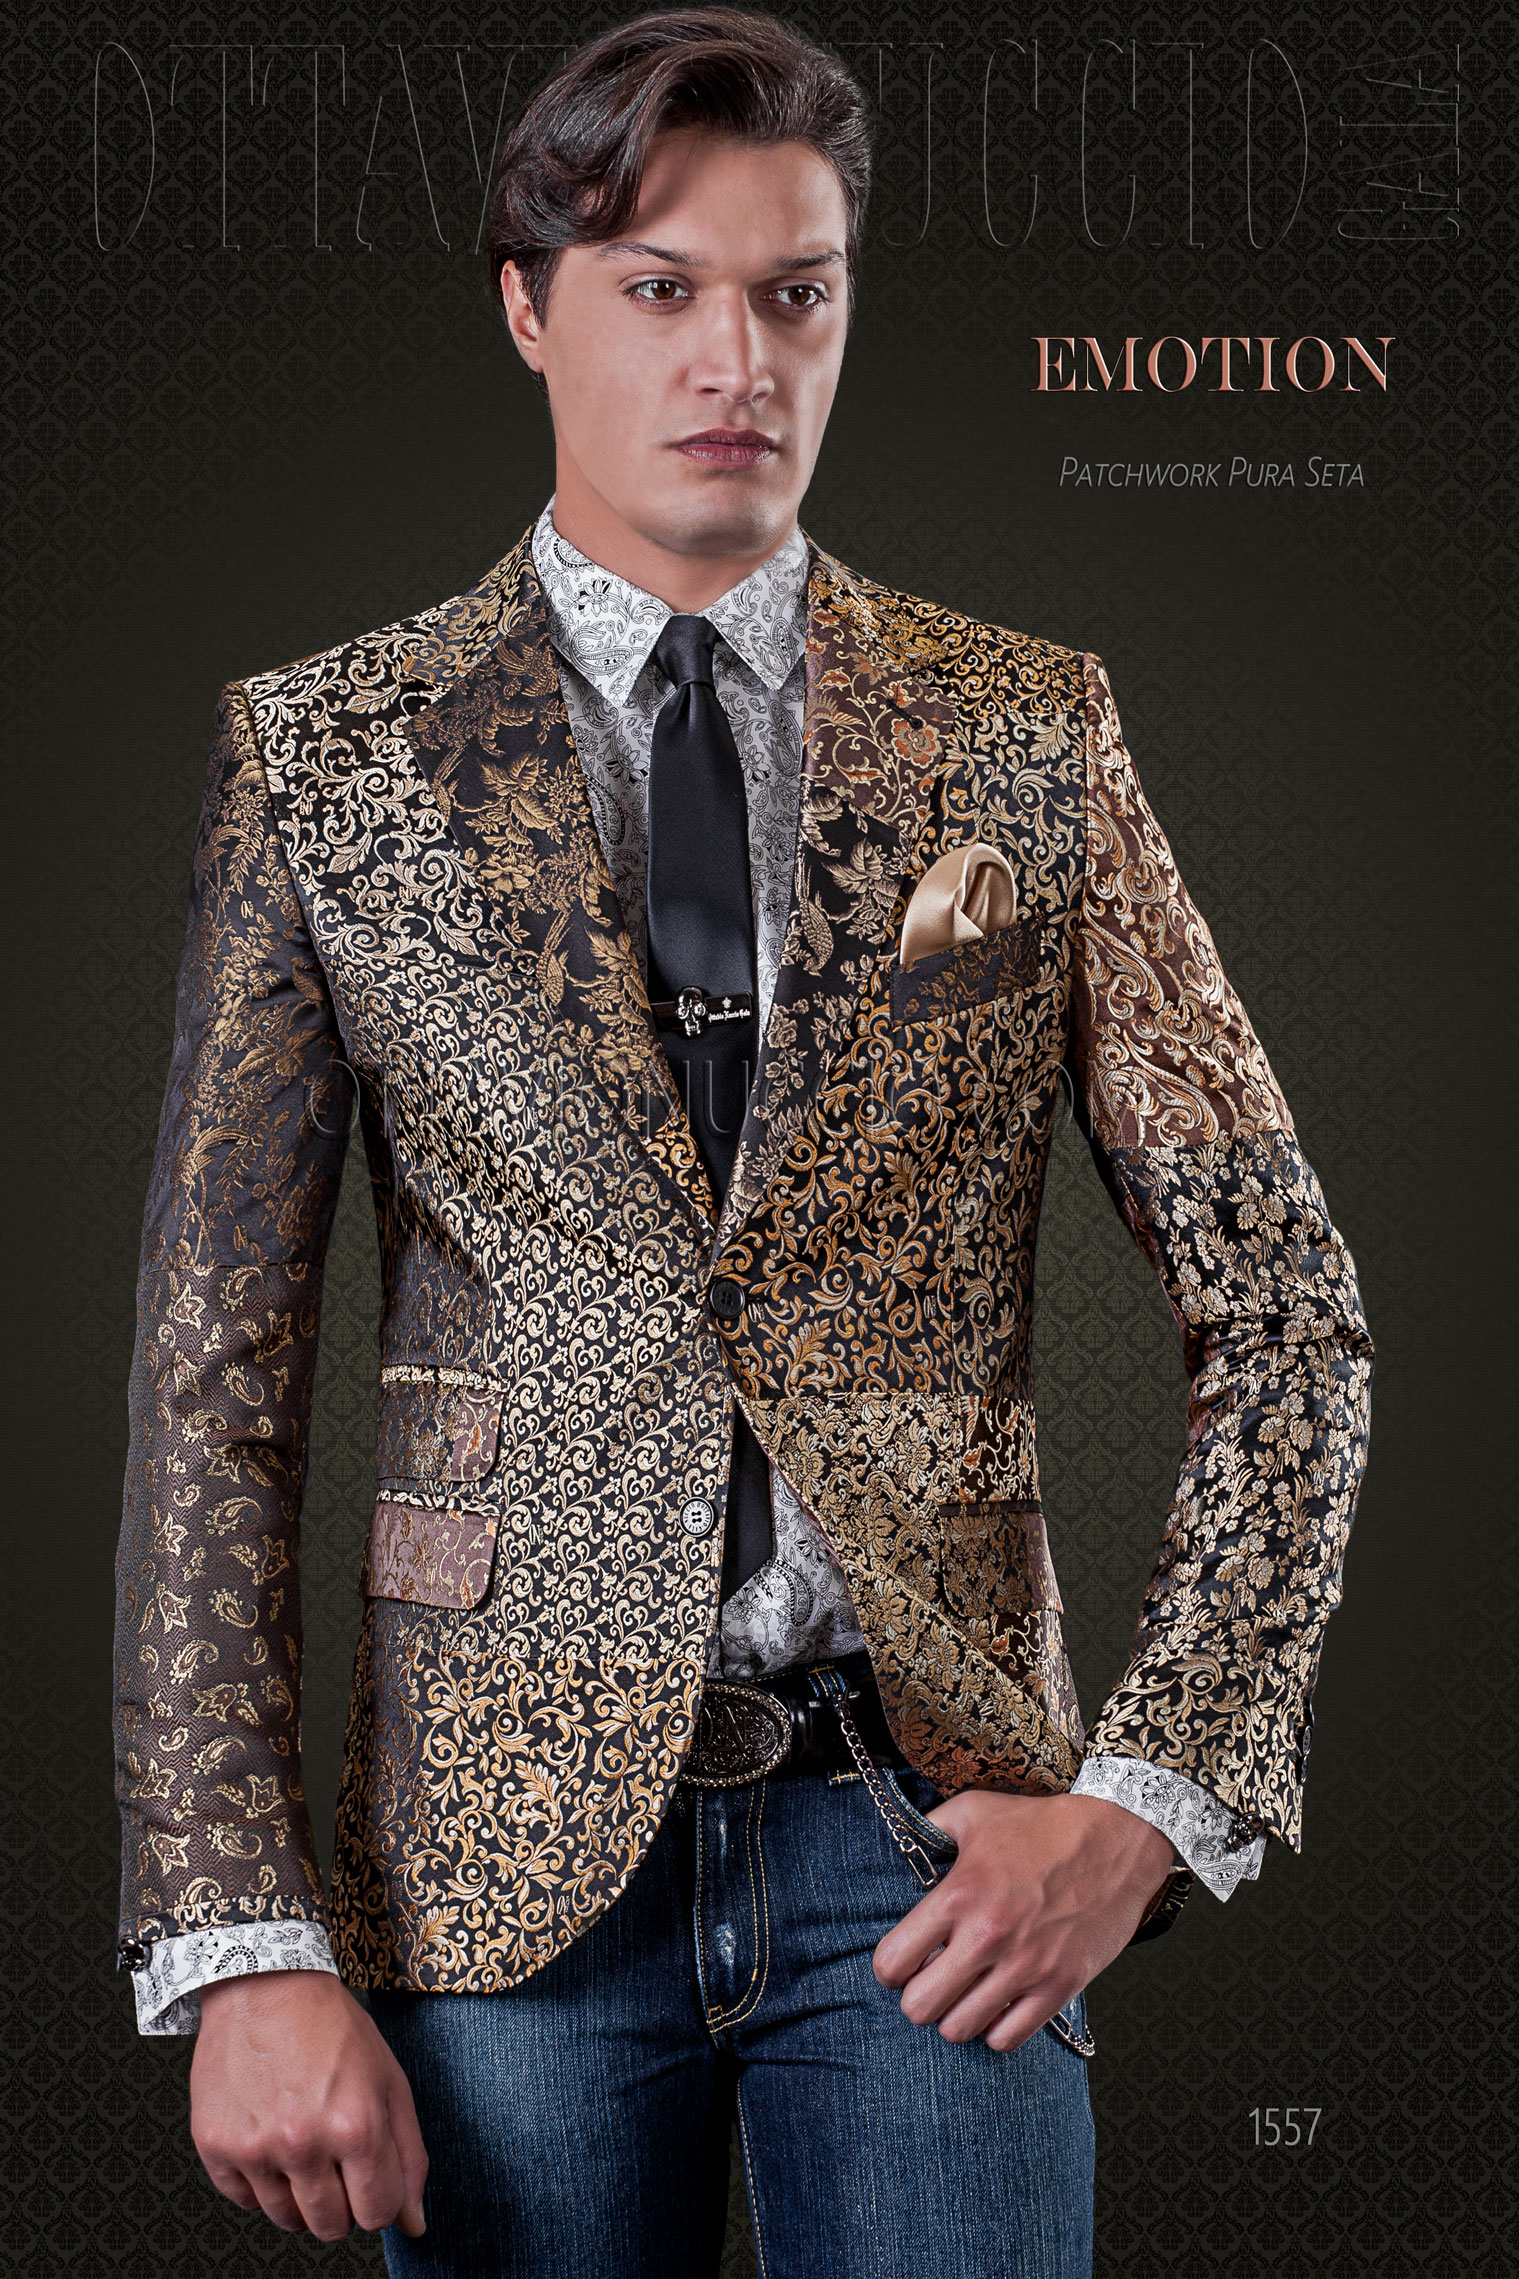 Giacca uomo patchwork in pura seta dorata